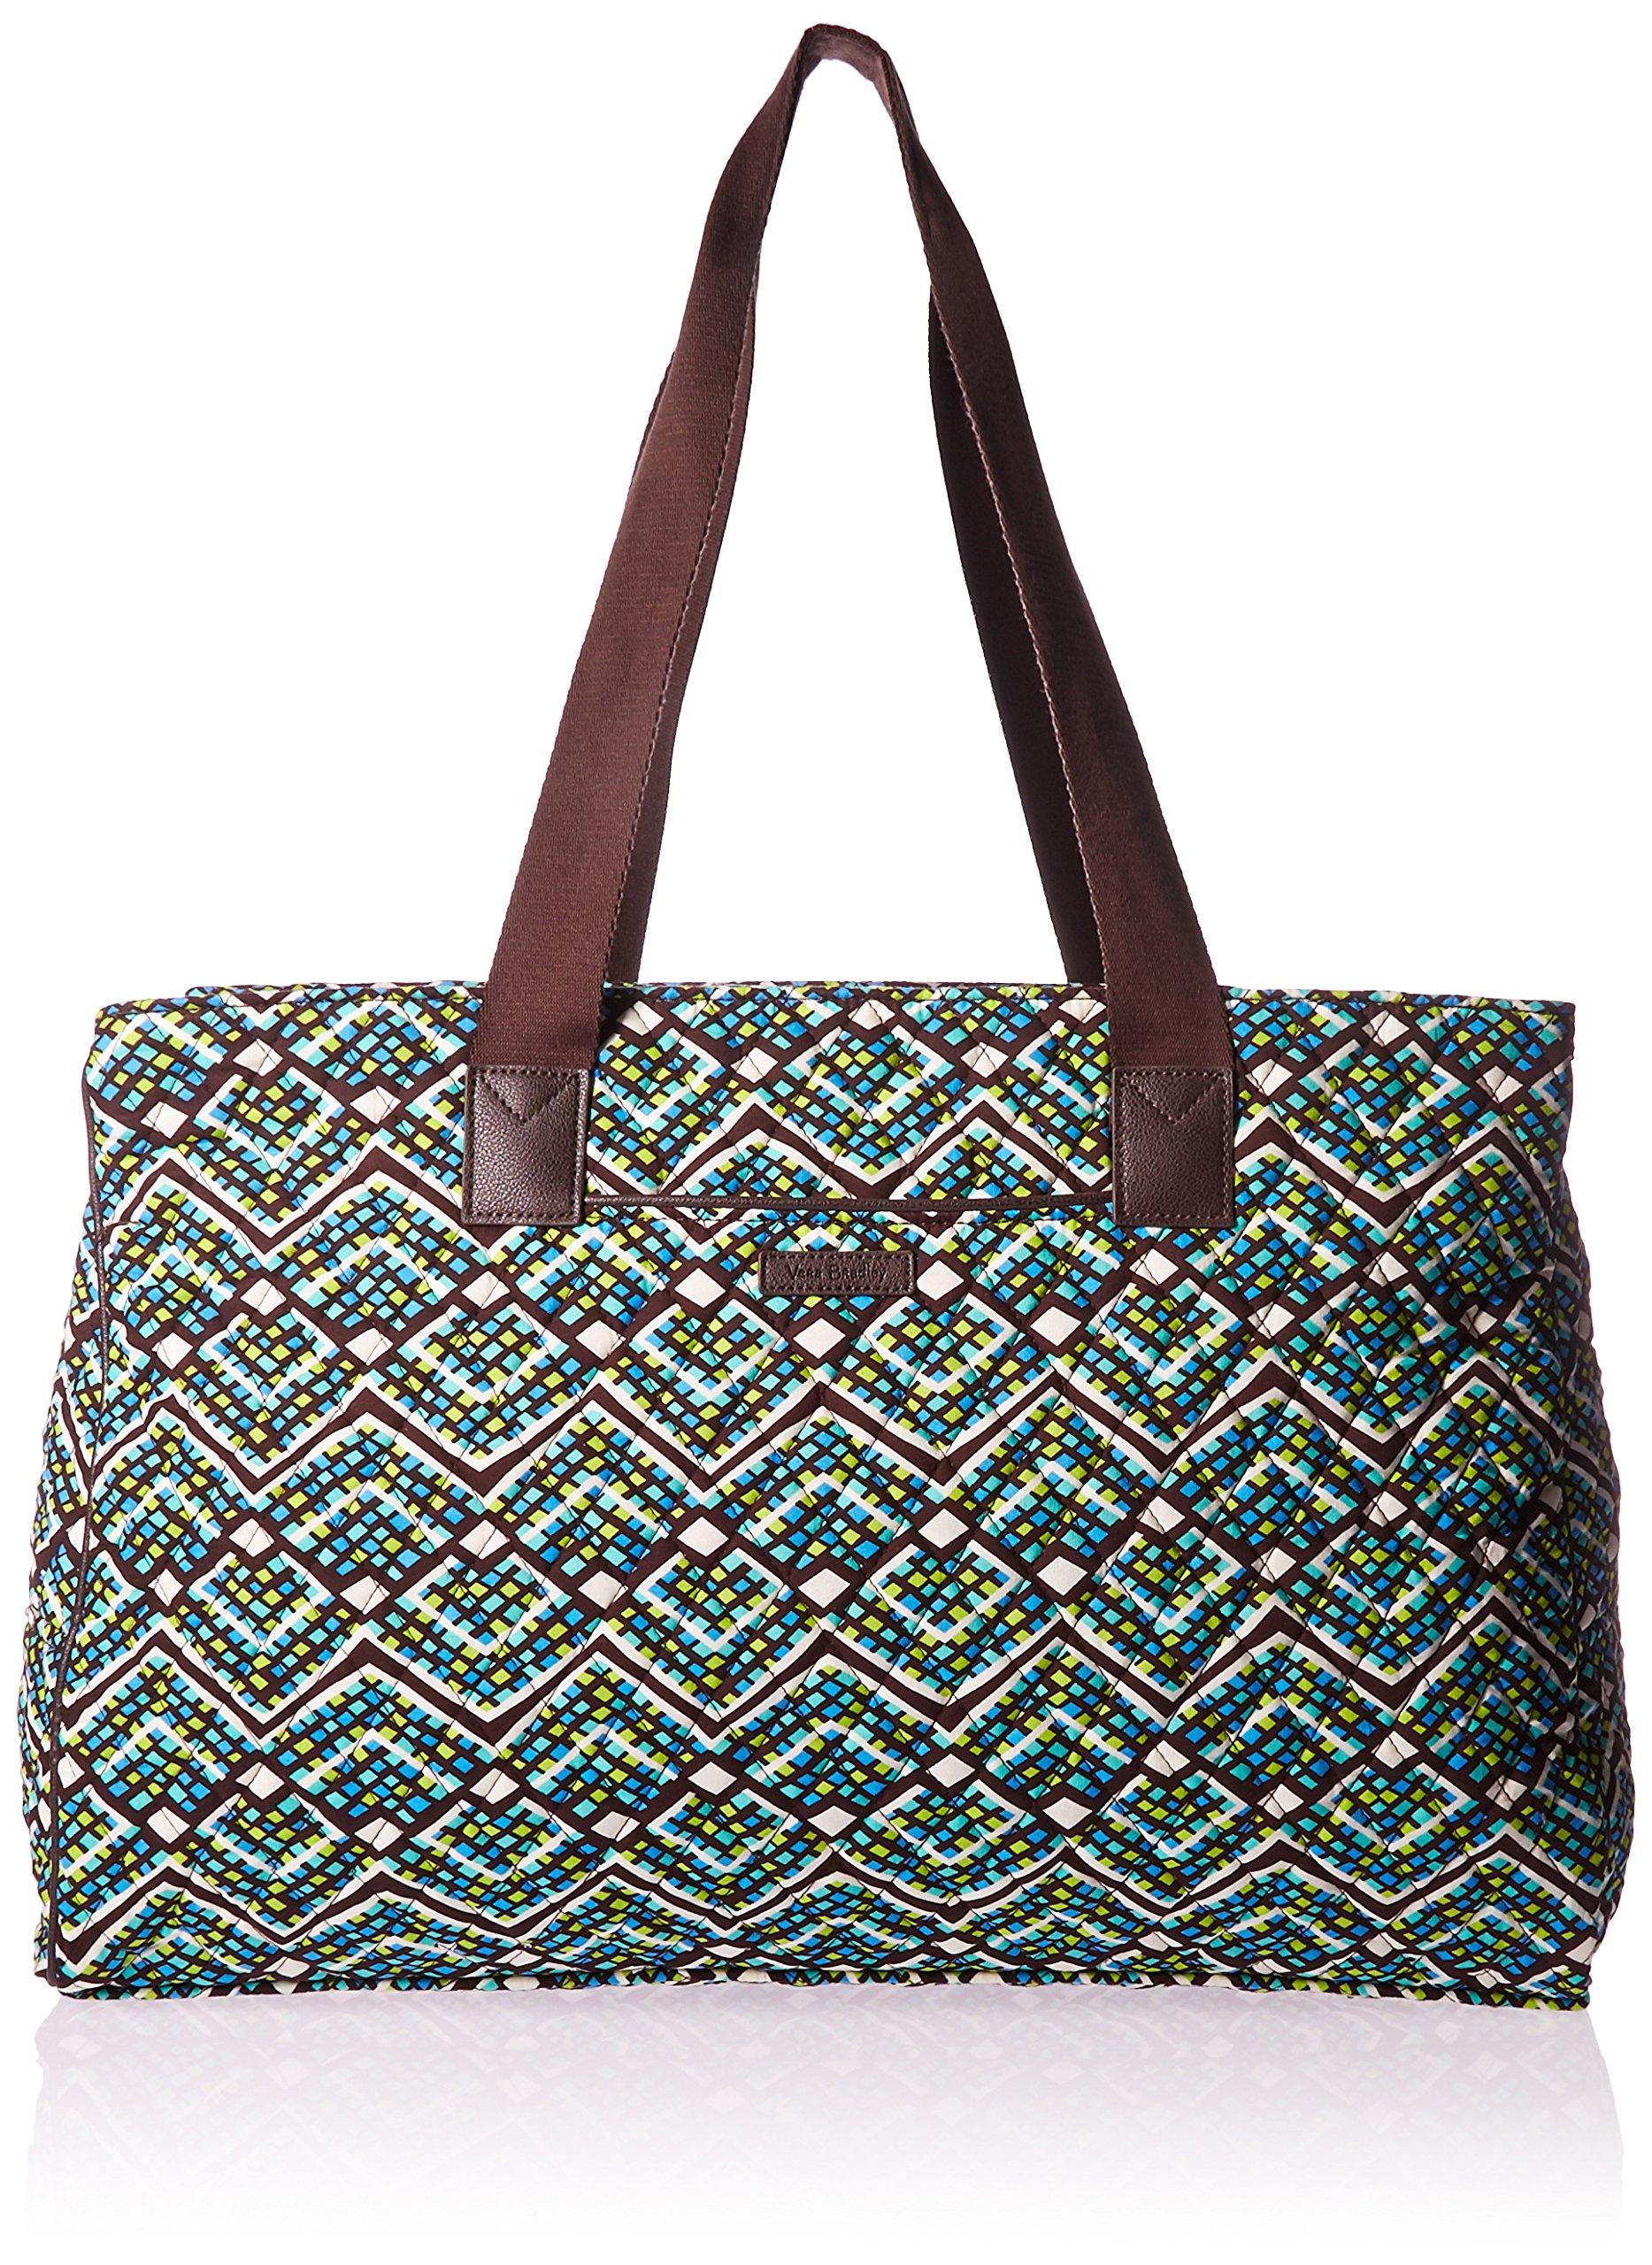 Vera Bradley Women's Triple Compartment Travel Bag